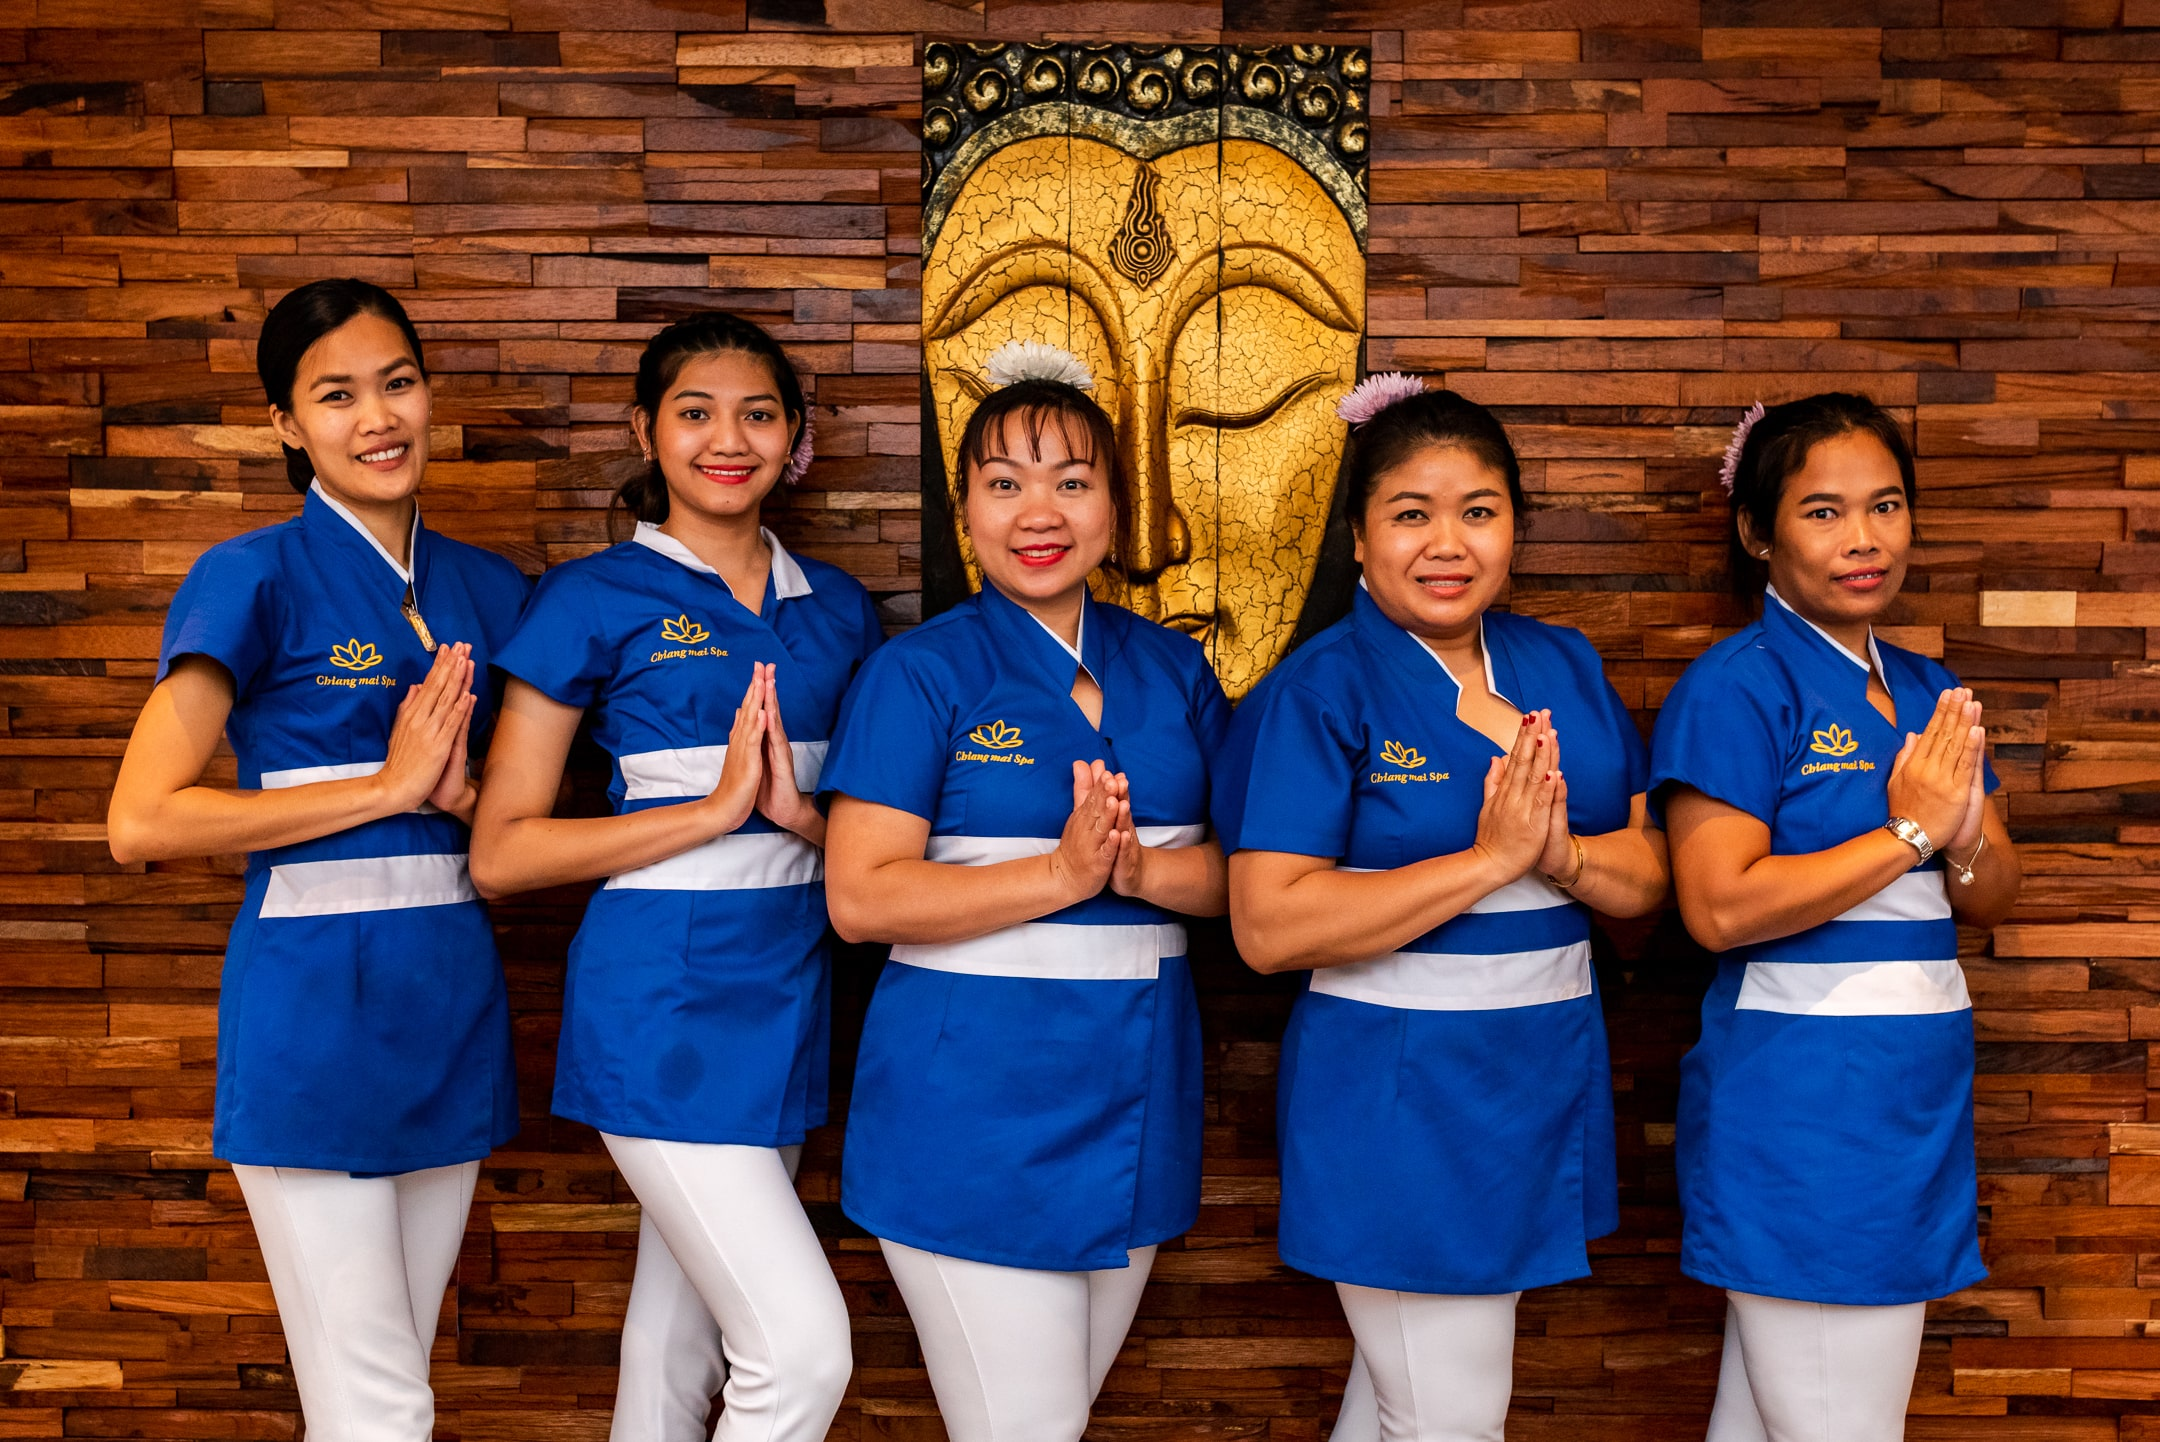 The Chiang Mai Spa team.